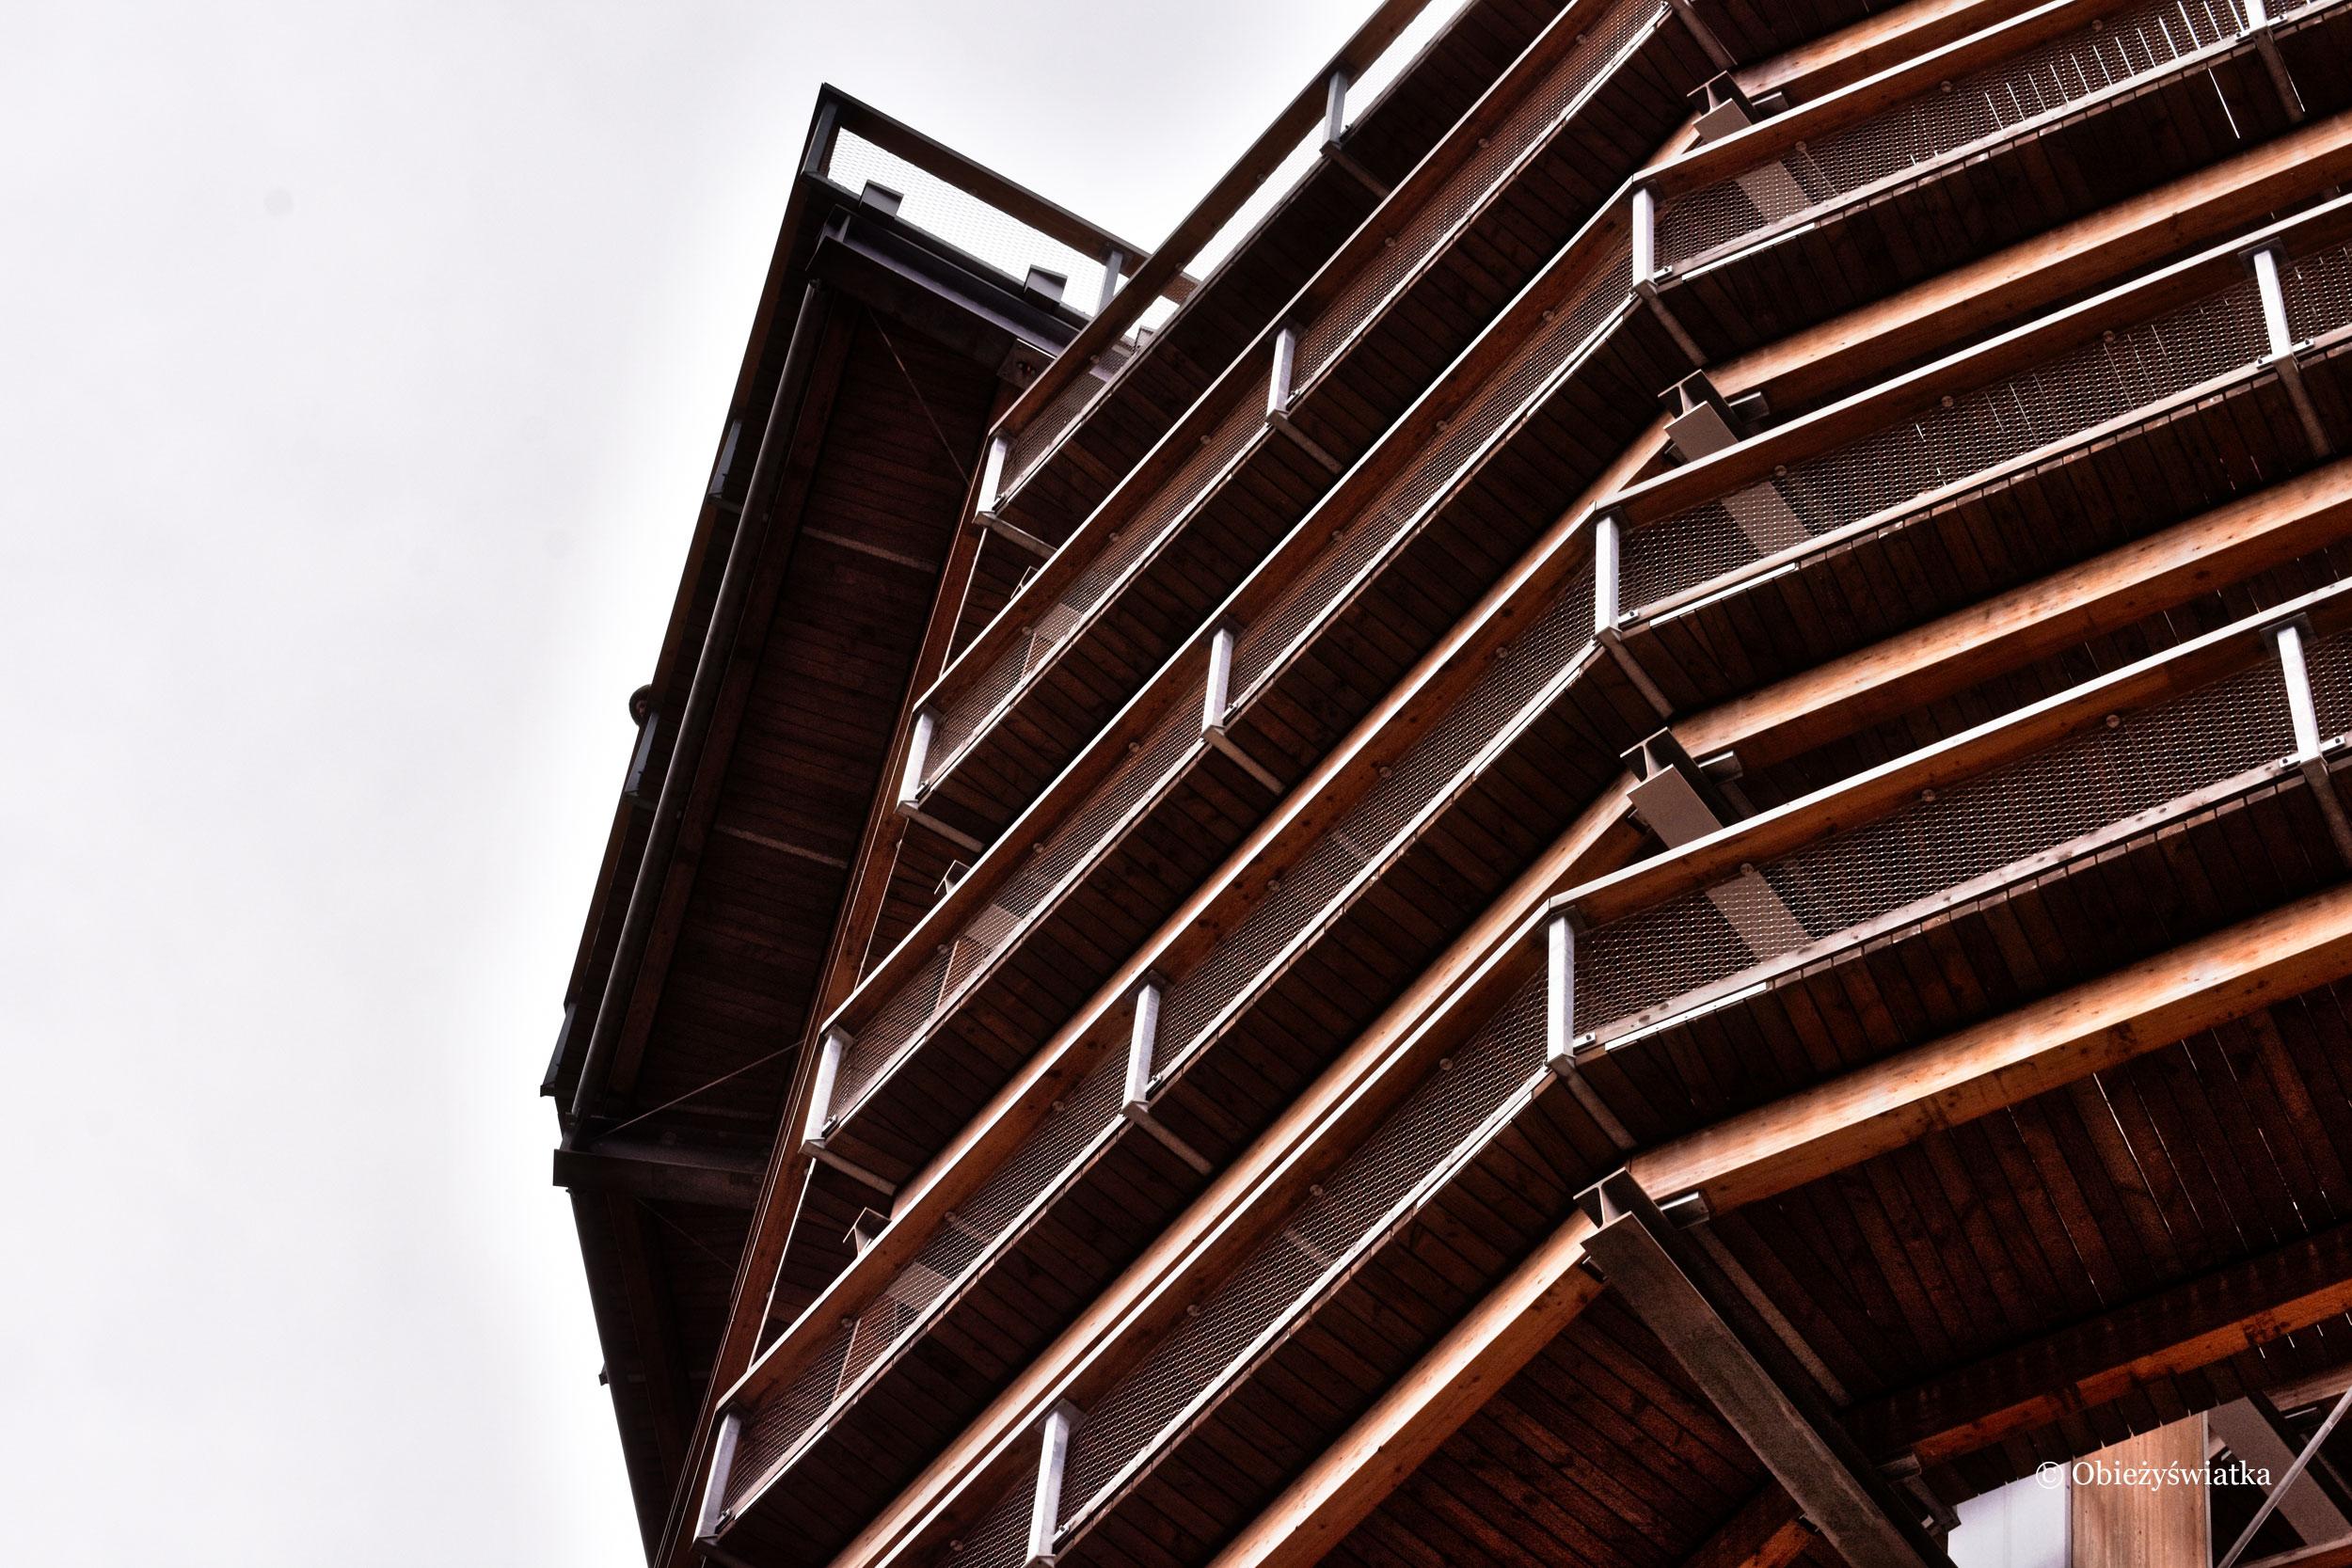 Wieża widokowa Saarschleife / Zakole Saary